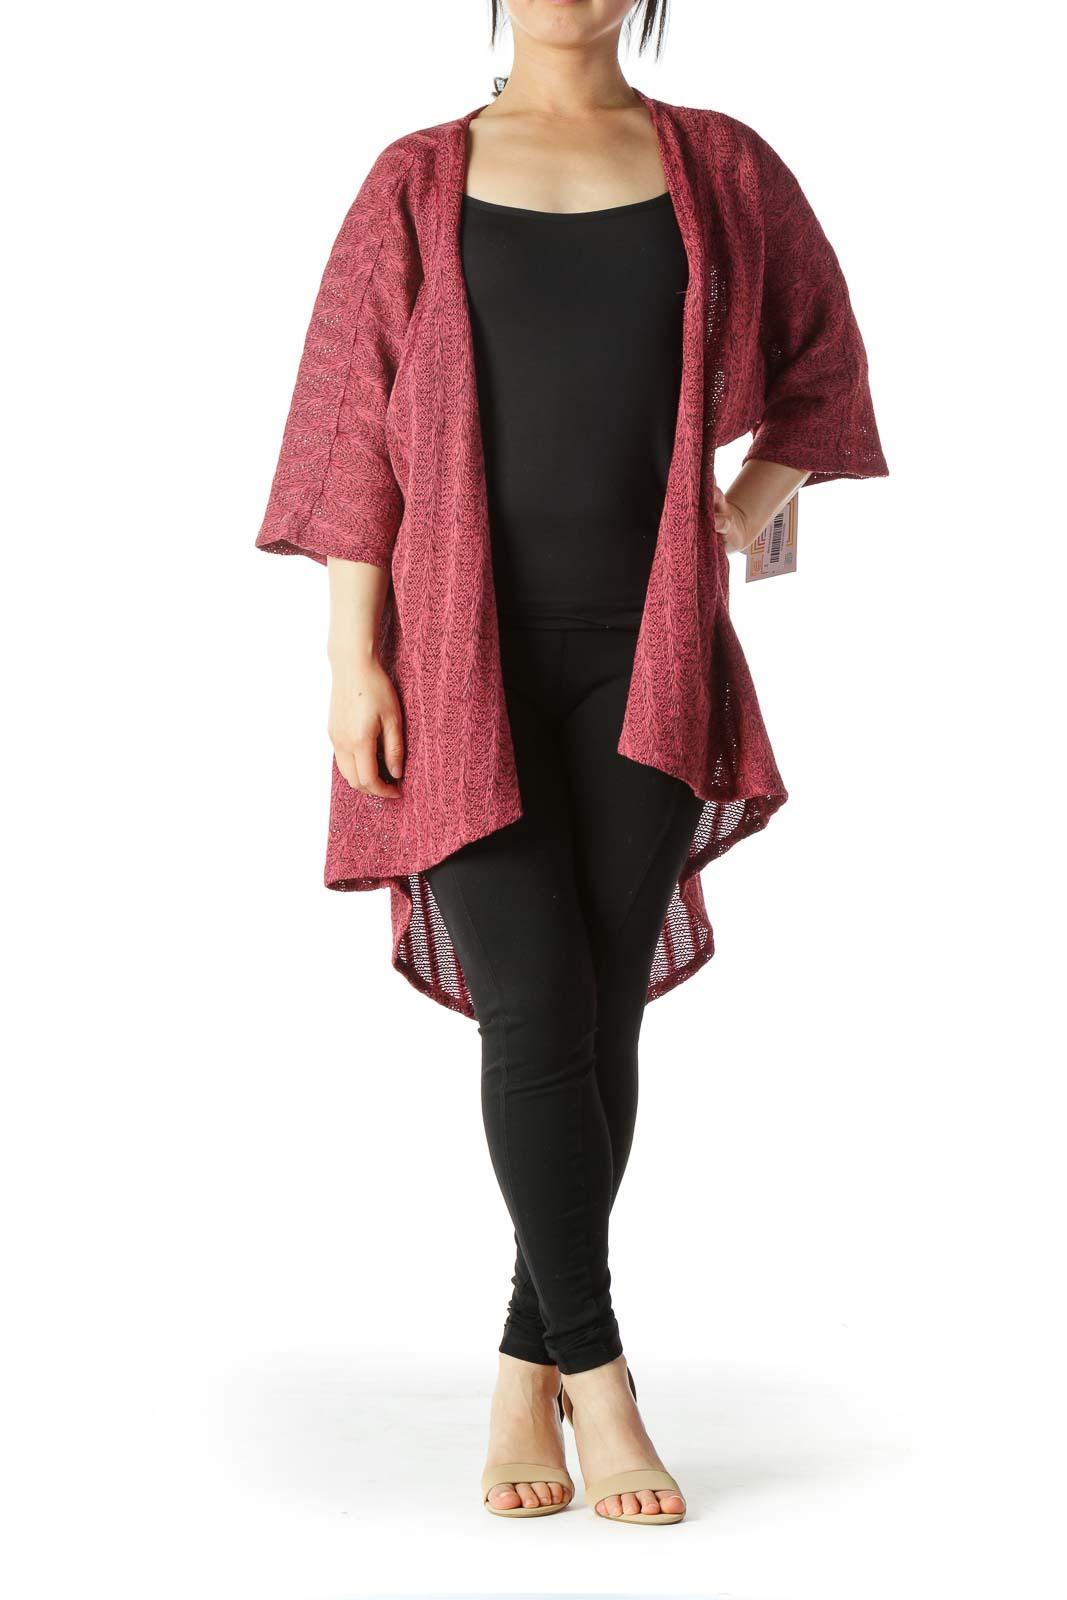 Red Black Short Sleeve Mix Knit Light Cardigan